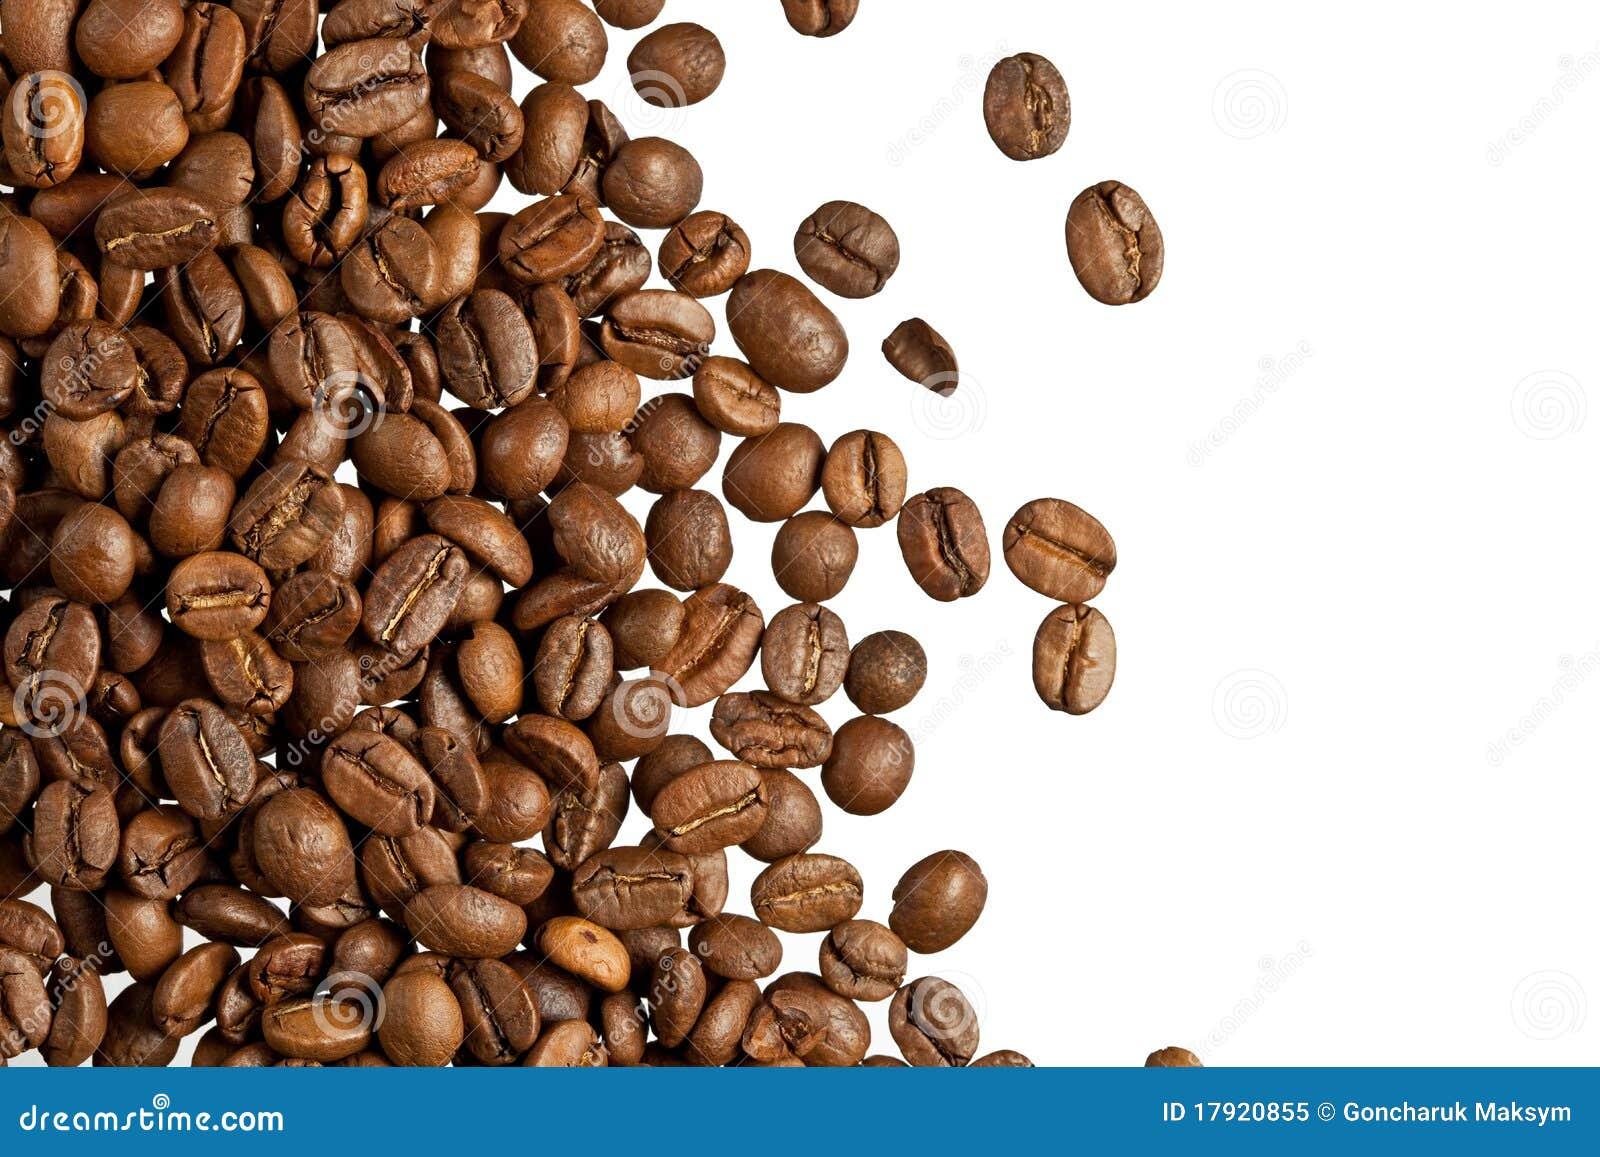 coffee grains stock image 4621303. Black Bedroom Furniture Sets. Home Design Ideas